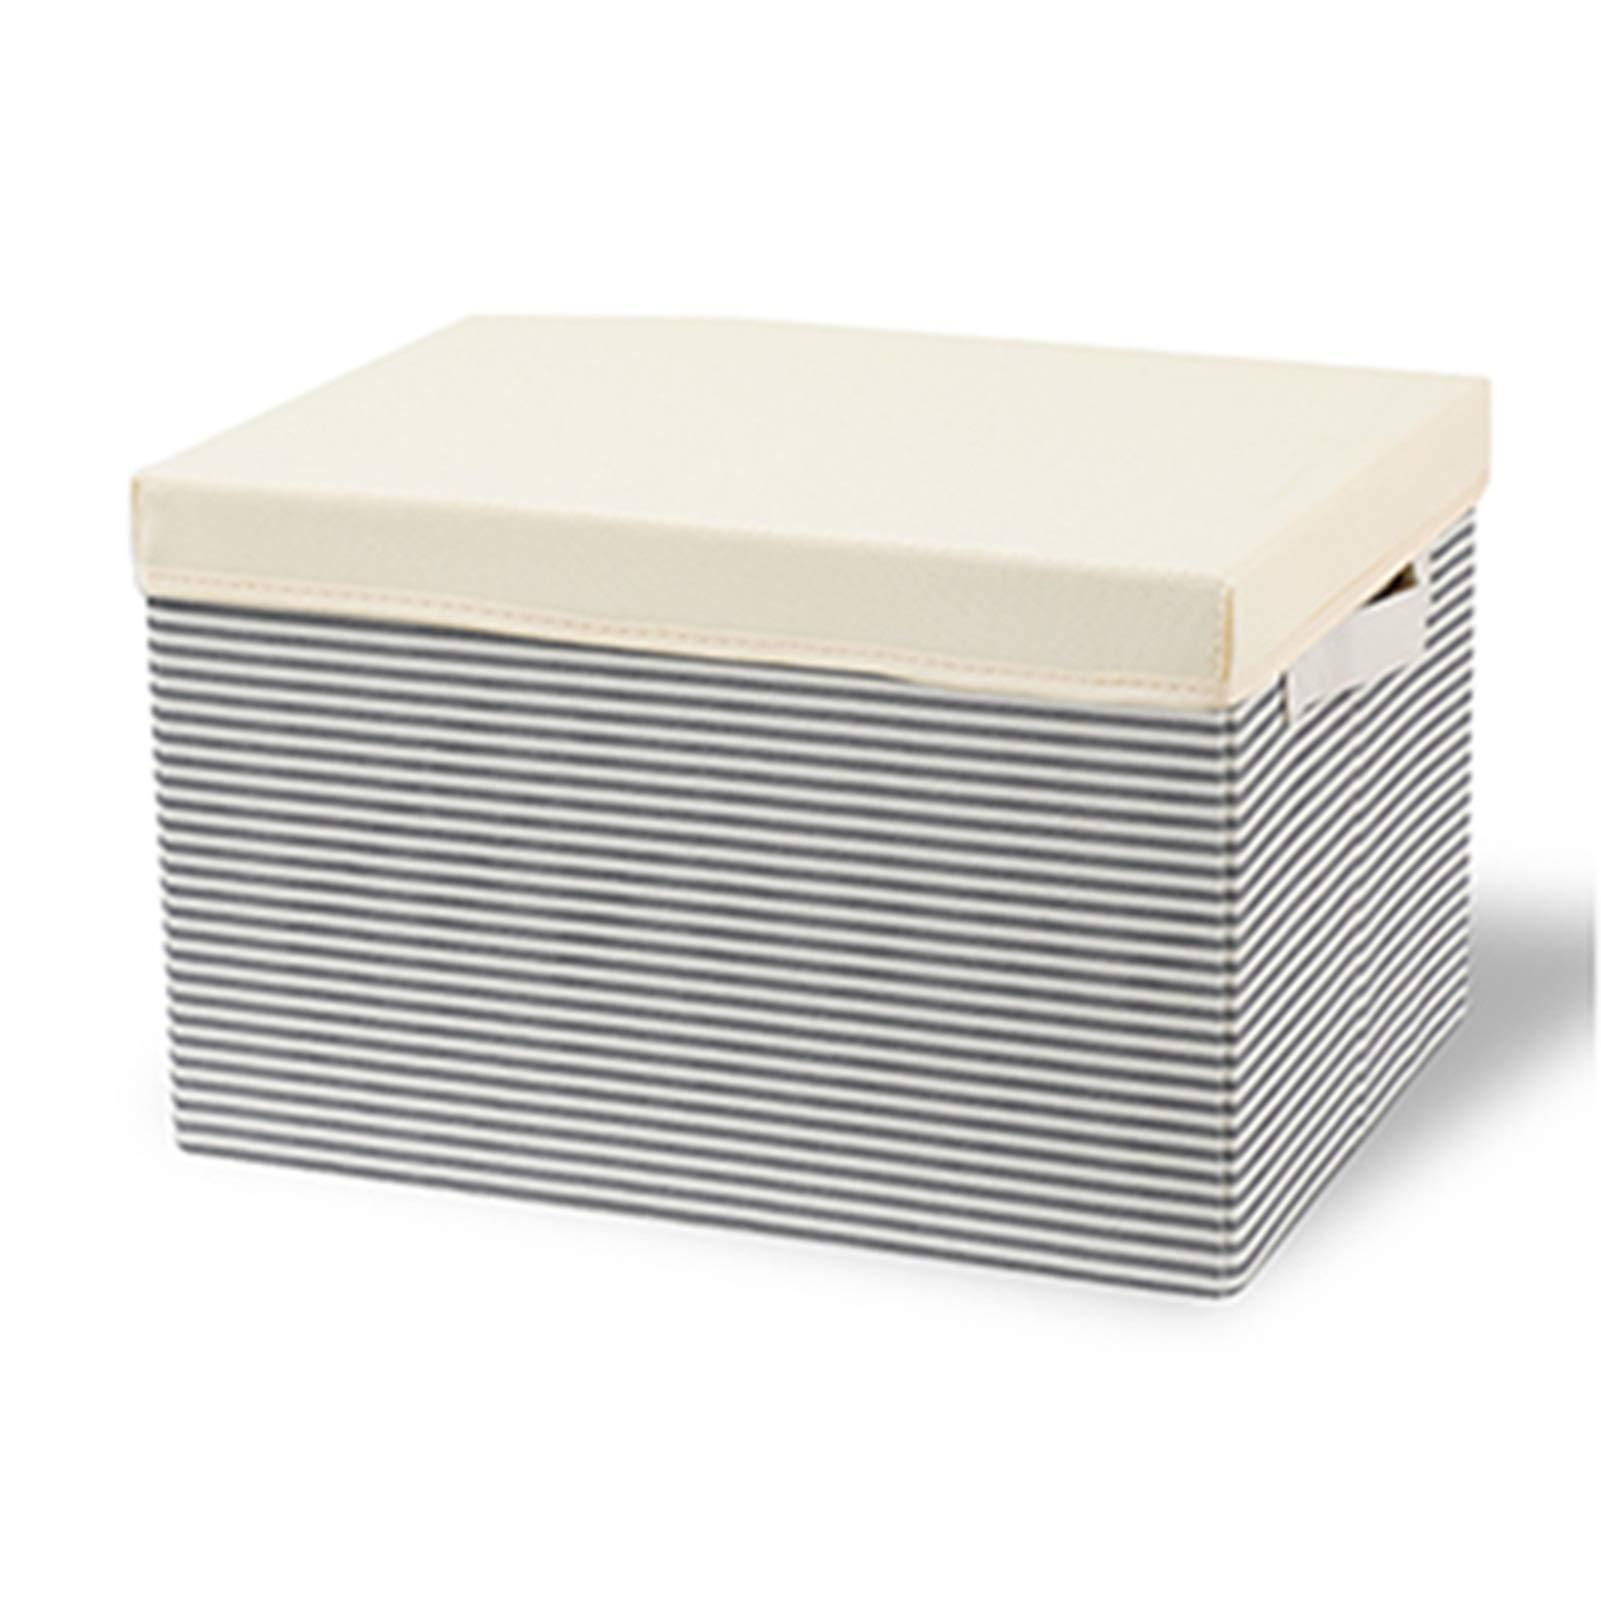 GLJ Caja de almacenaje Caja de Almacenamiento Plegable, Organizador de Ropa de Juguete para Armario, Caja de Almacenamiento Lavable con Tapa, 40 X 30 X 25 cm, Paquete de 4/5/6/9: Amazon.es: Hogar